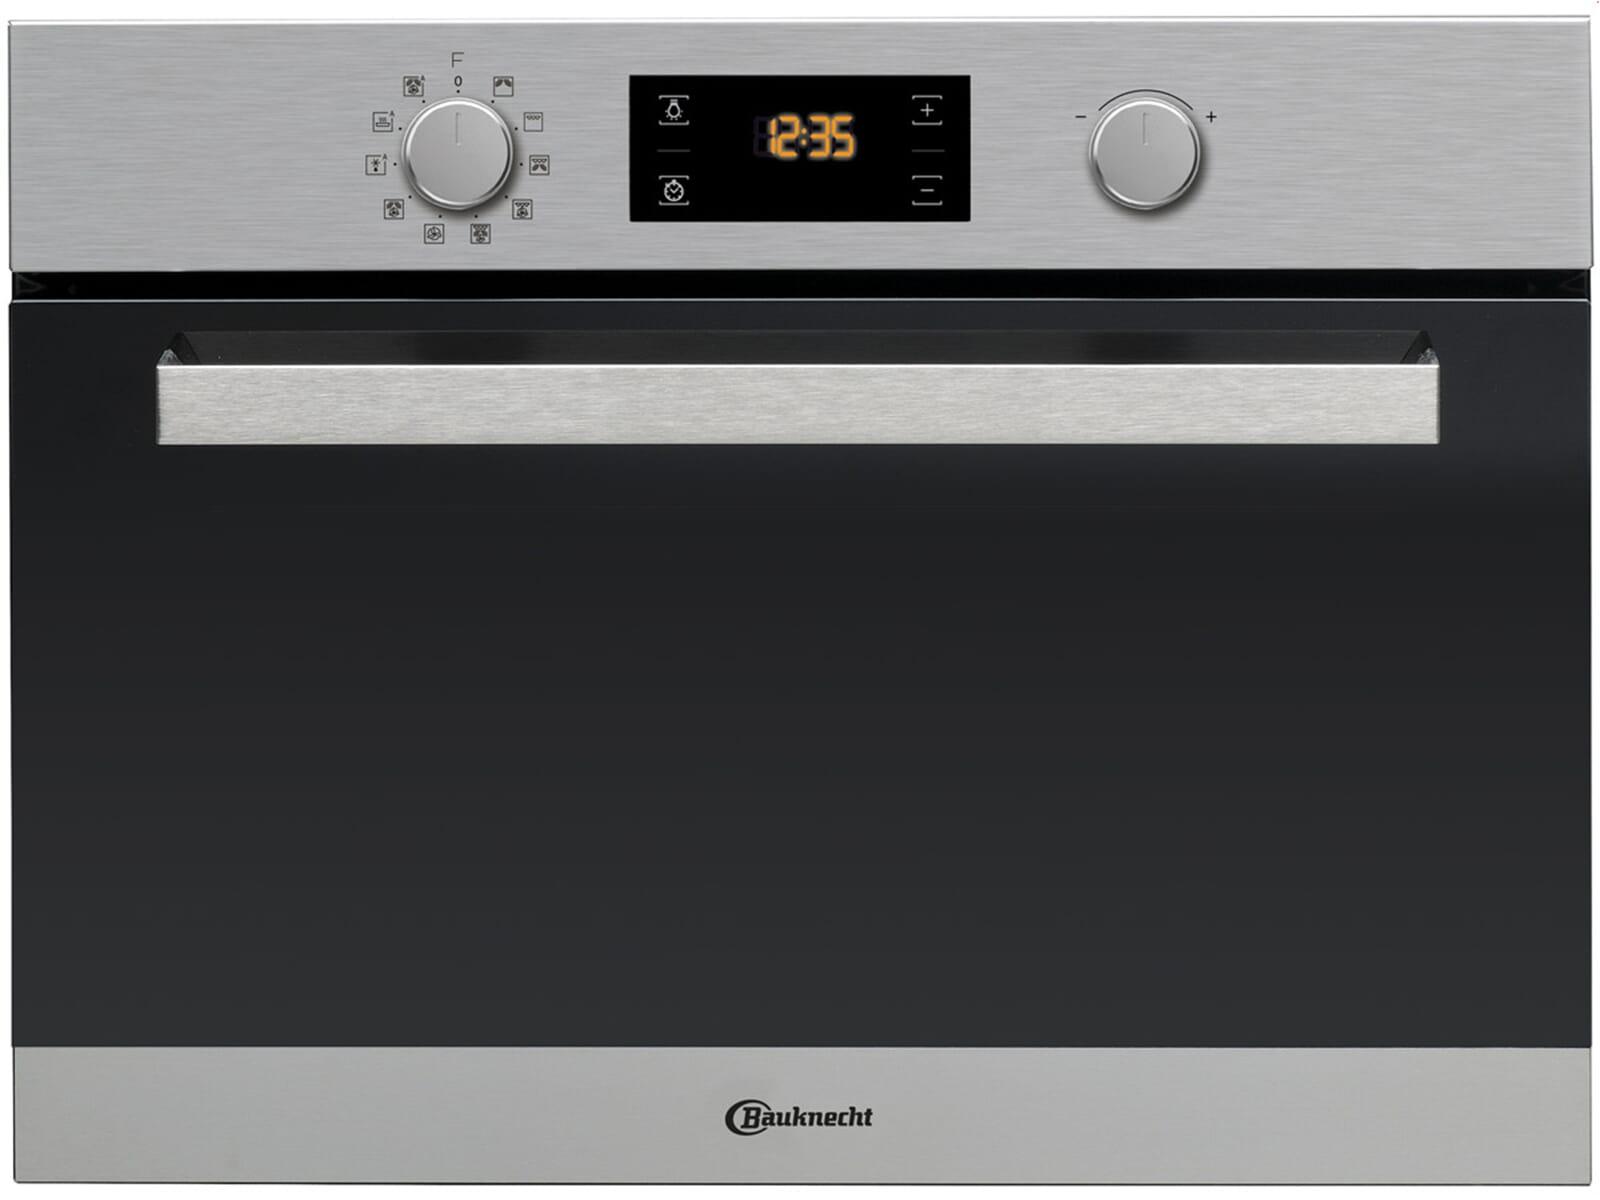 Produktabbildung Bauknecht EMPK3 3545 IN Einbau-Mikrowelle Edelstahl